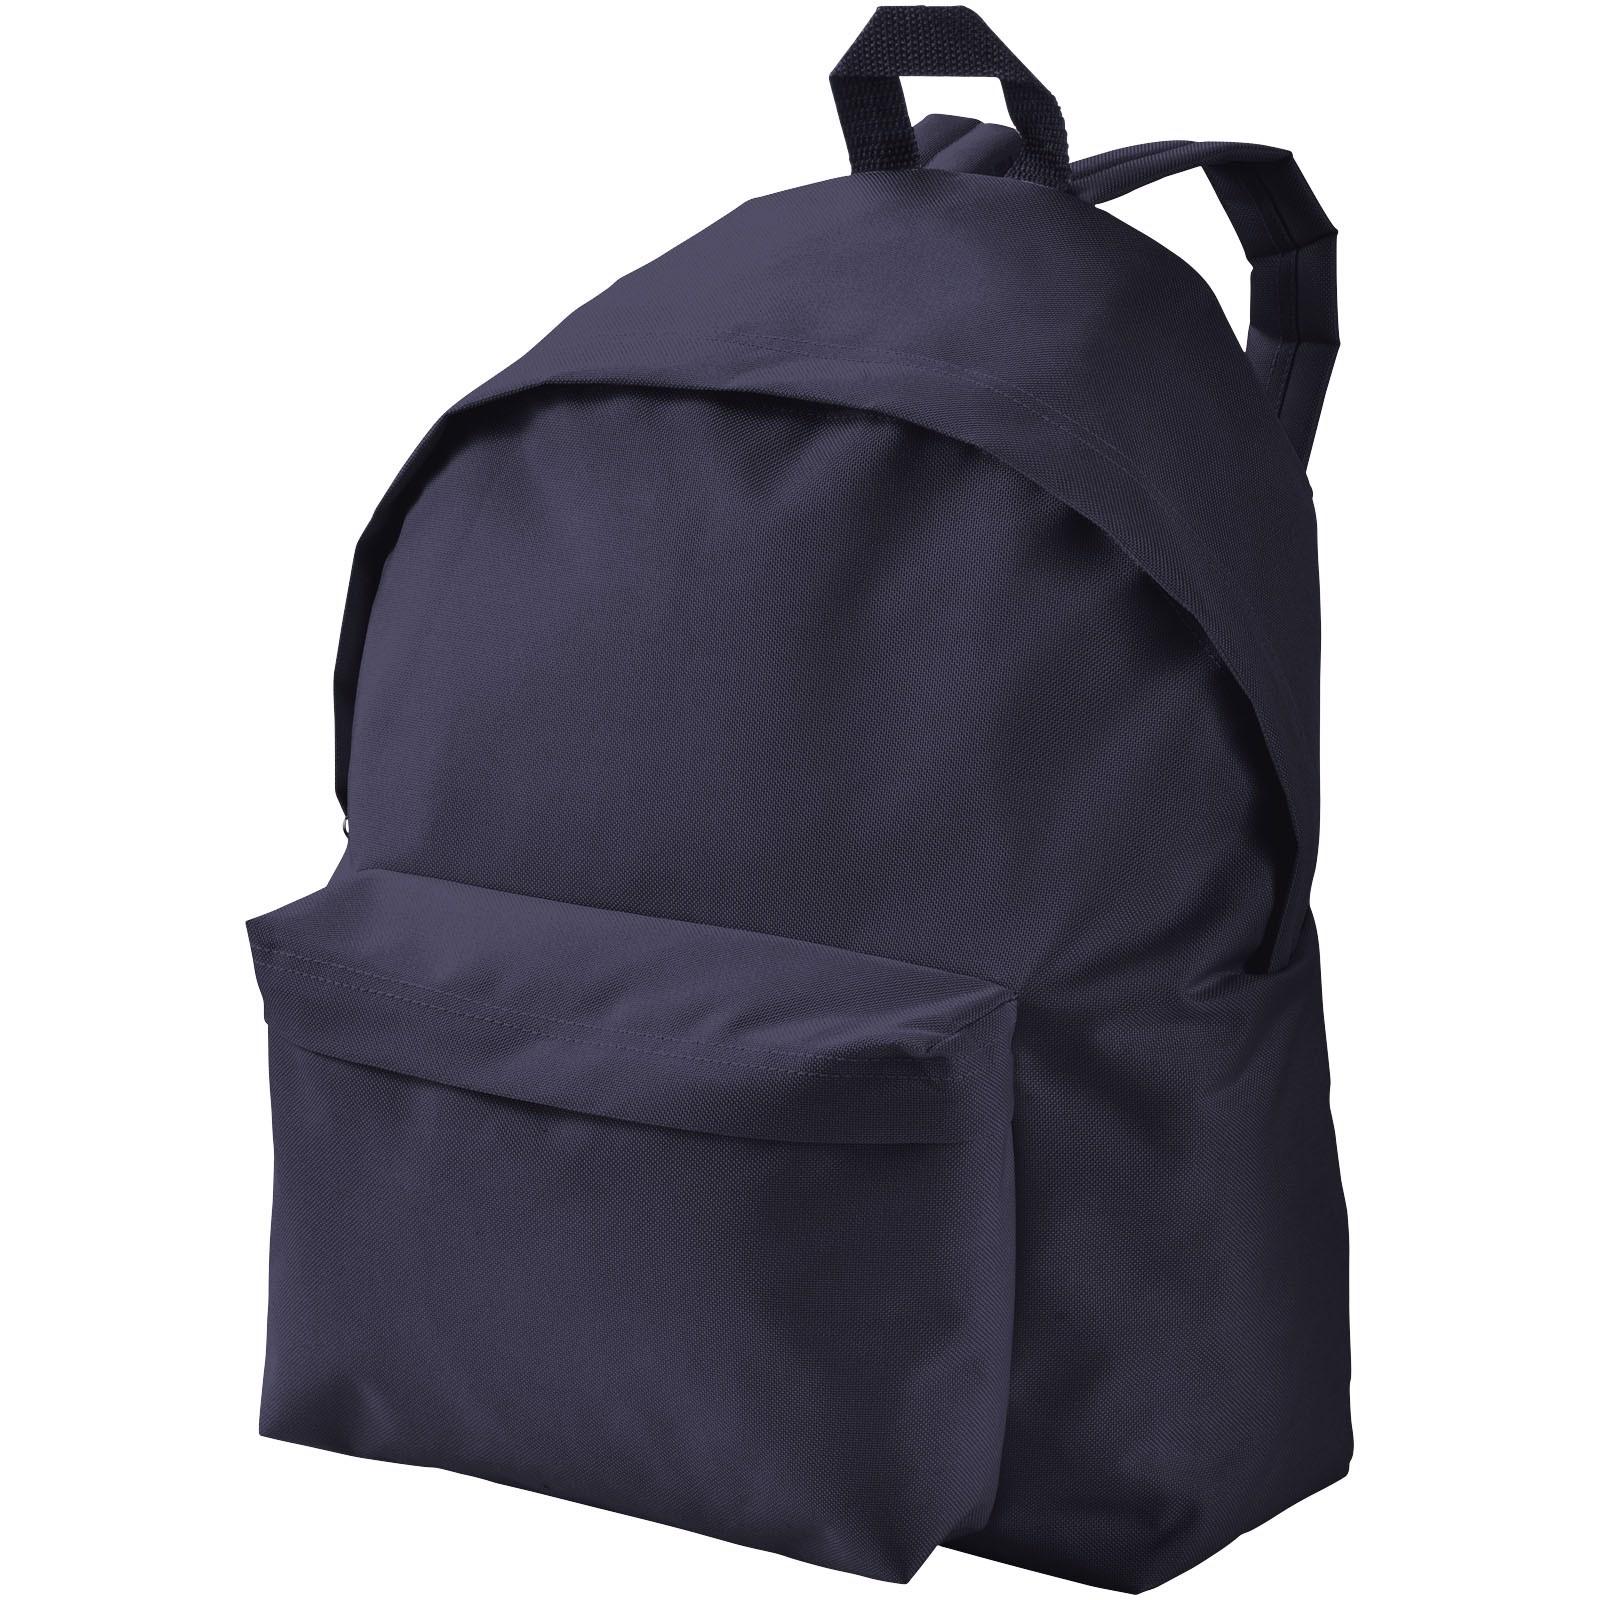 Urban covered zipper backpack - Navy